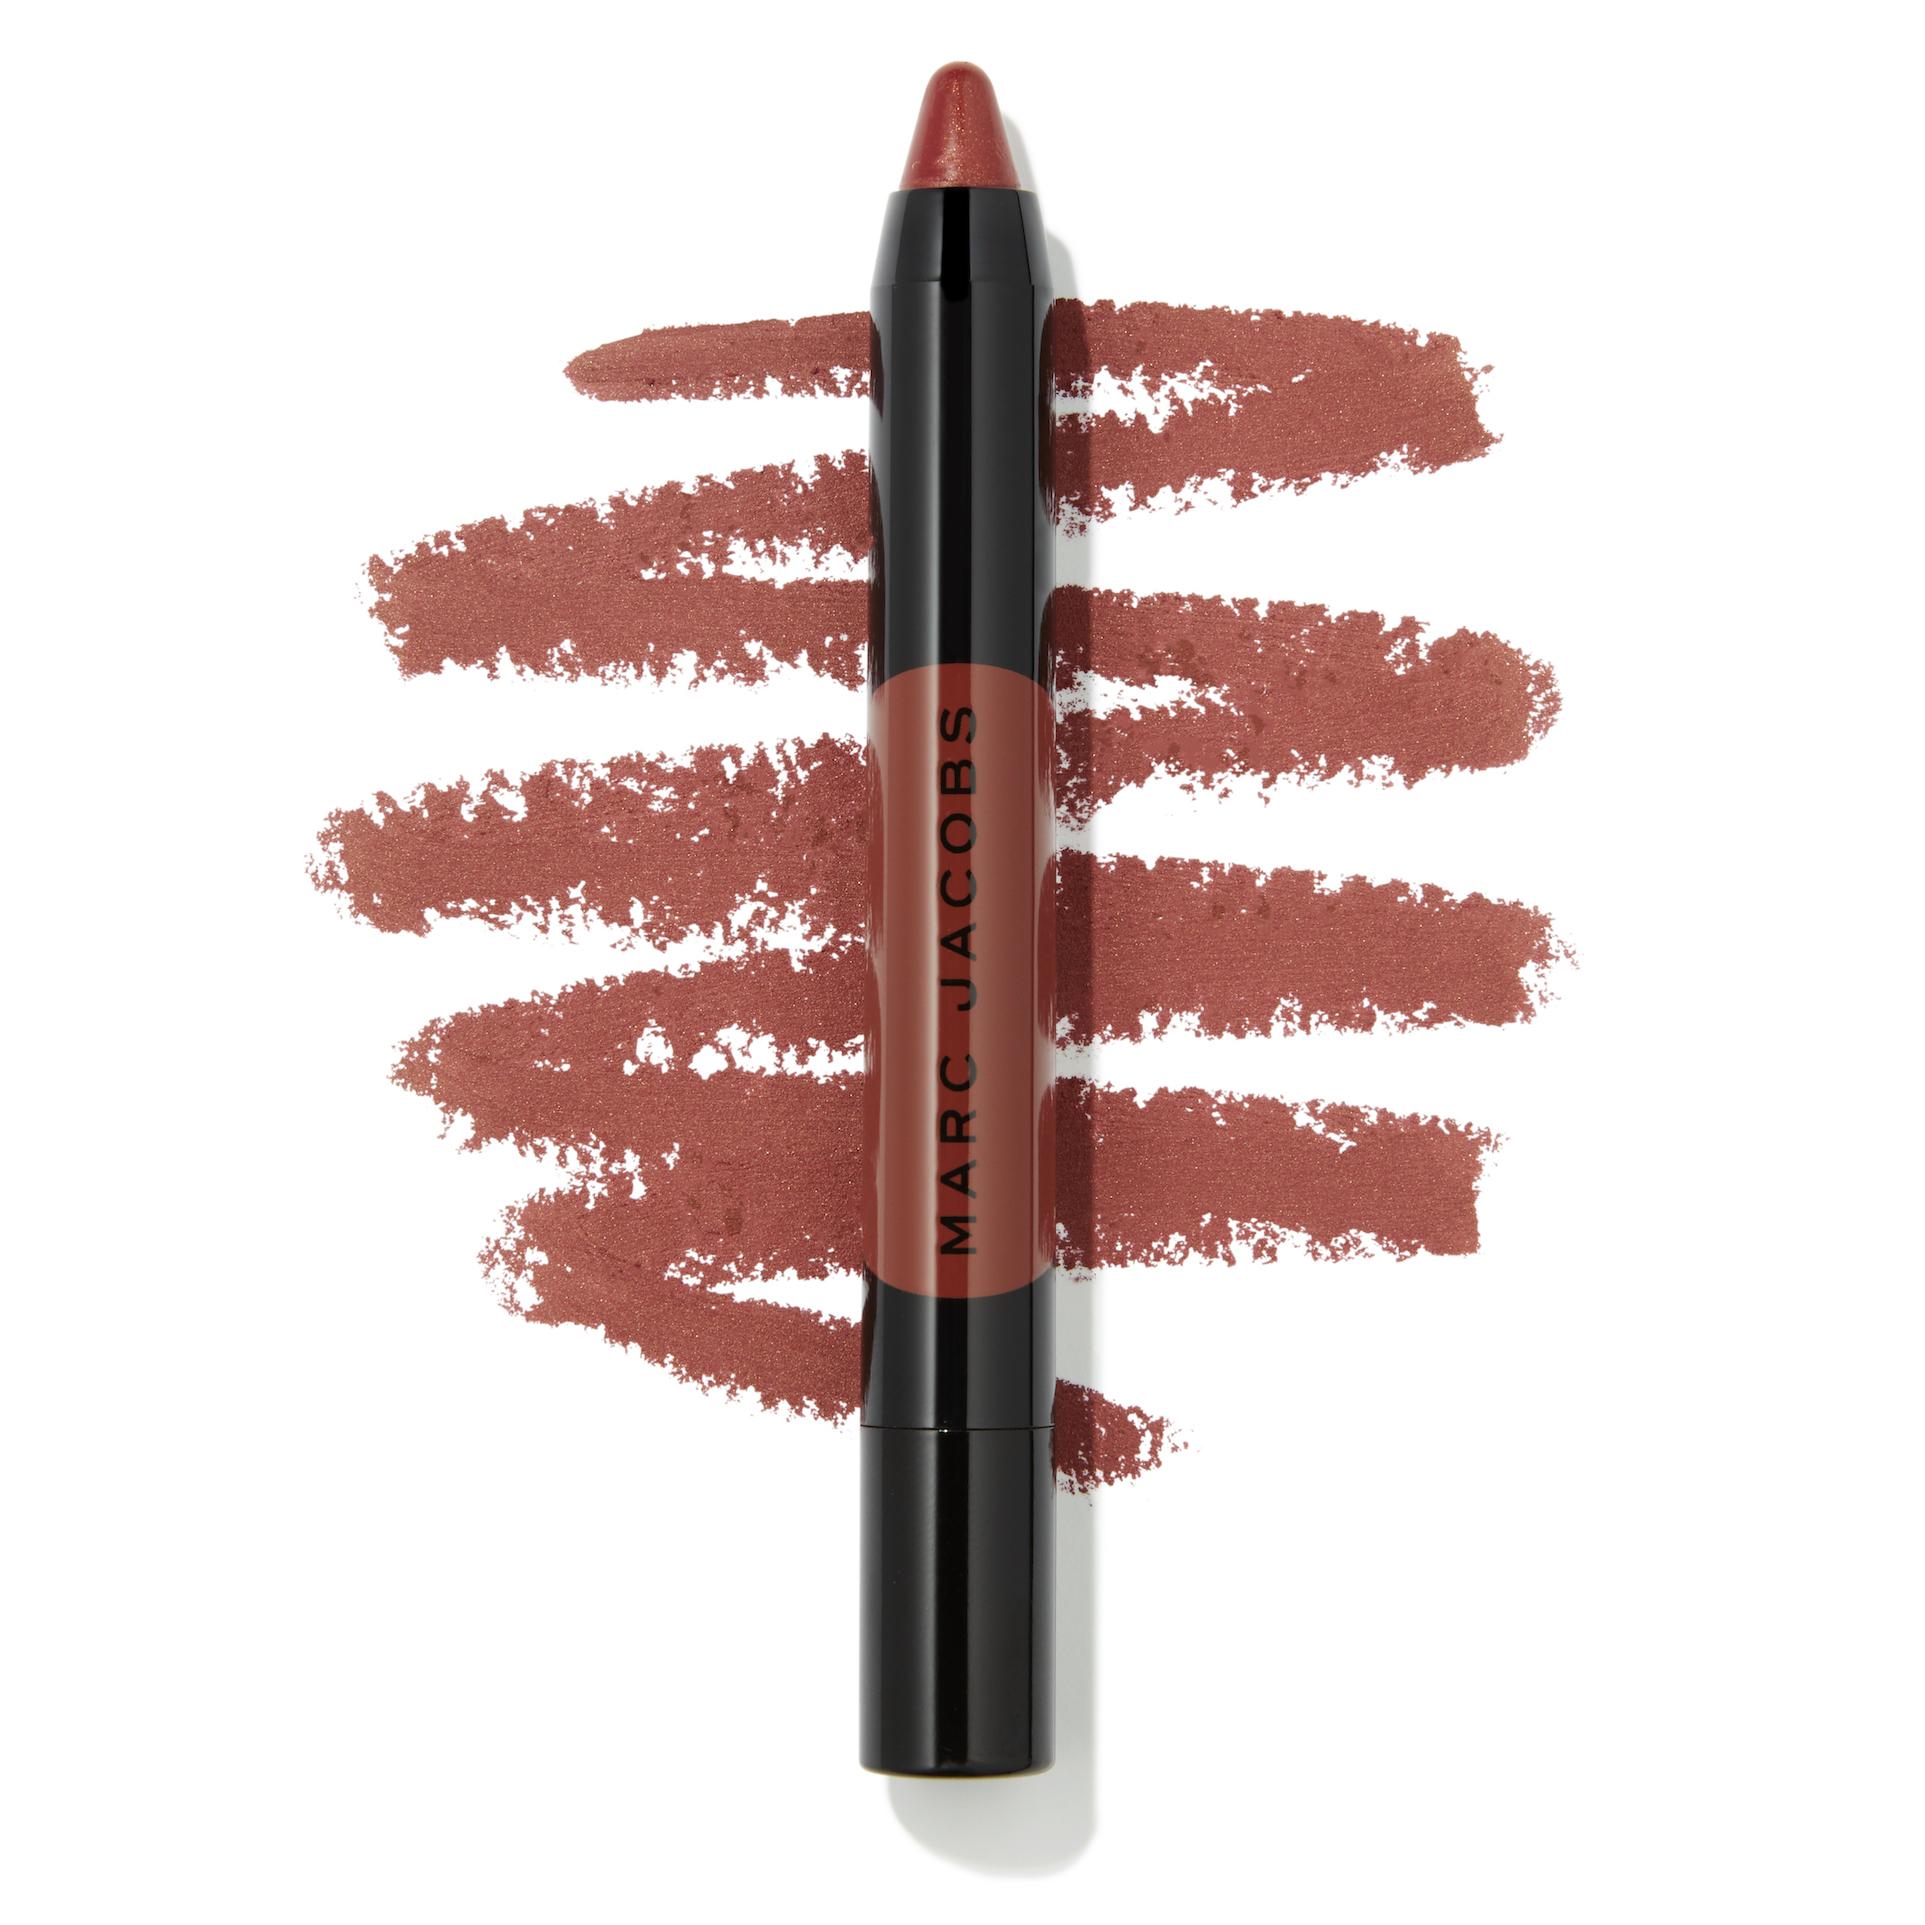 Marc Jacobs Beauty Le Marc Liquid Lip Crayon - Burn Notice Swatch - AED 125